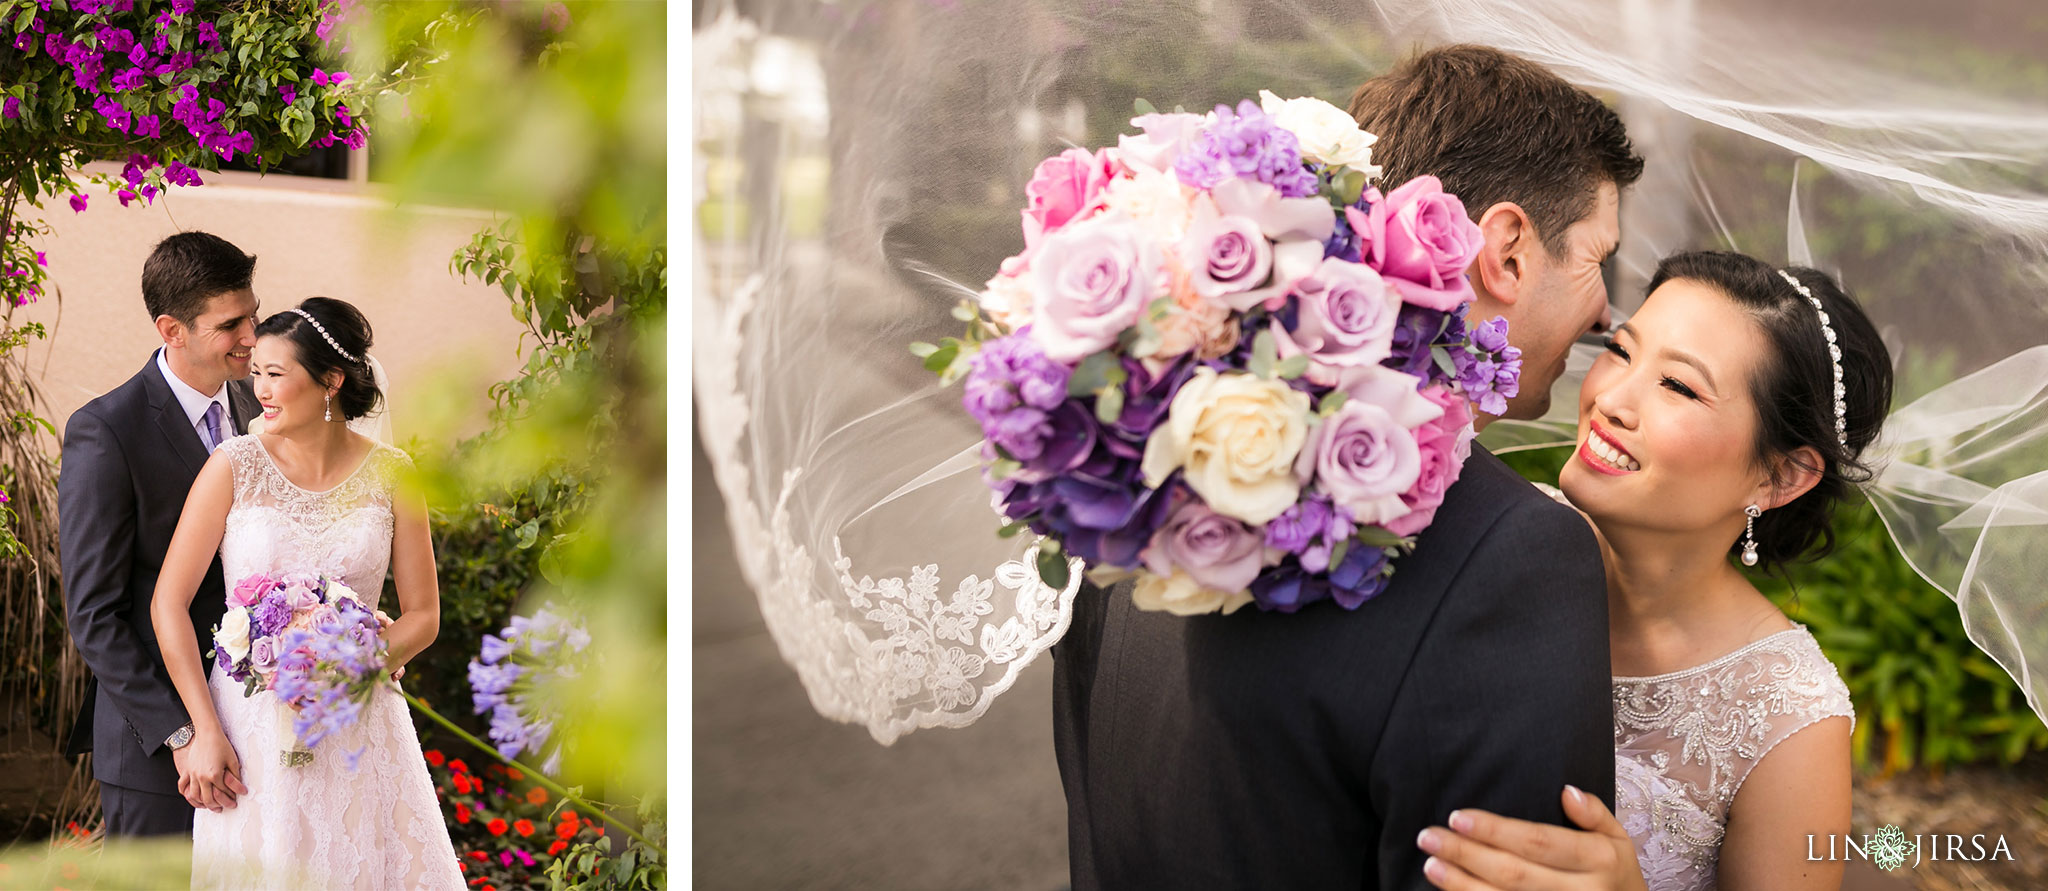 13 seacliff country club huntington beach wedding photography